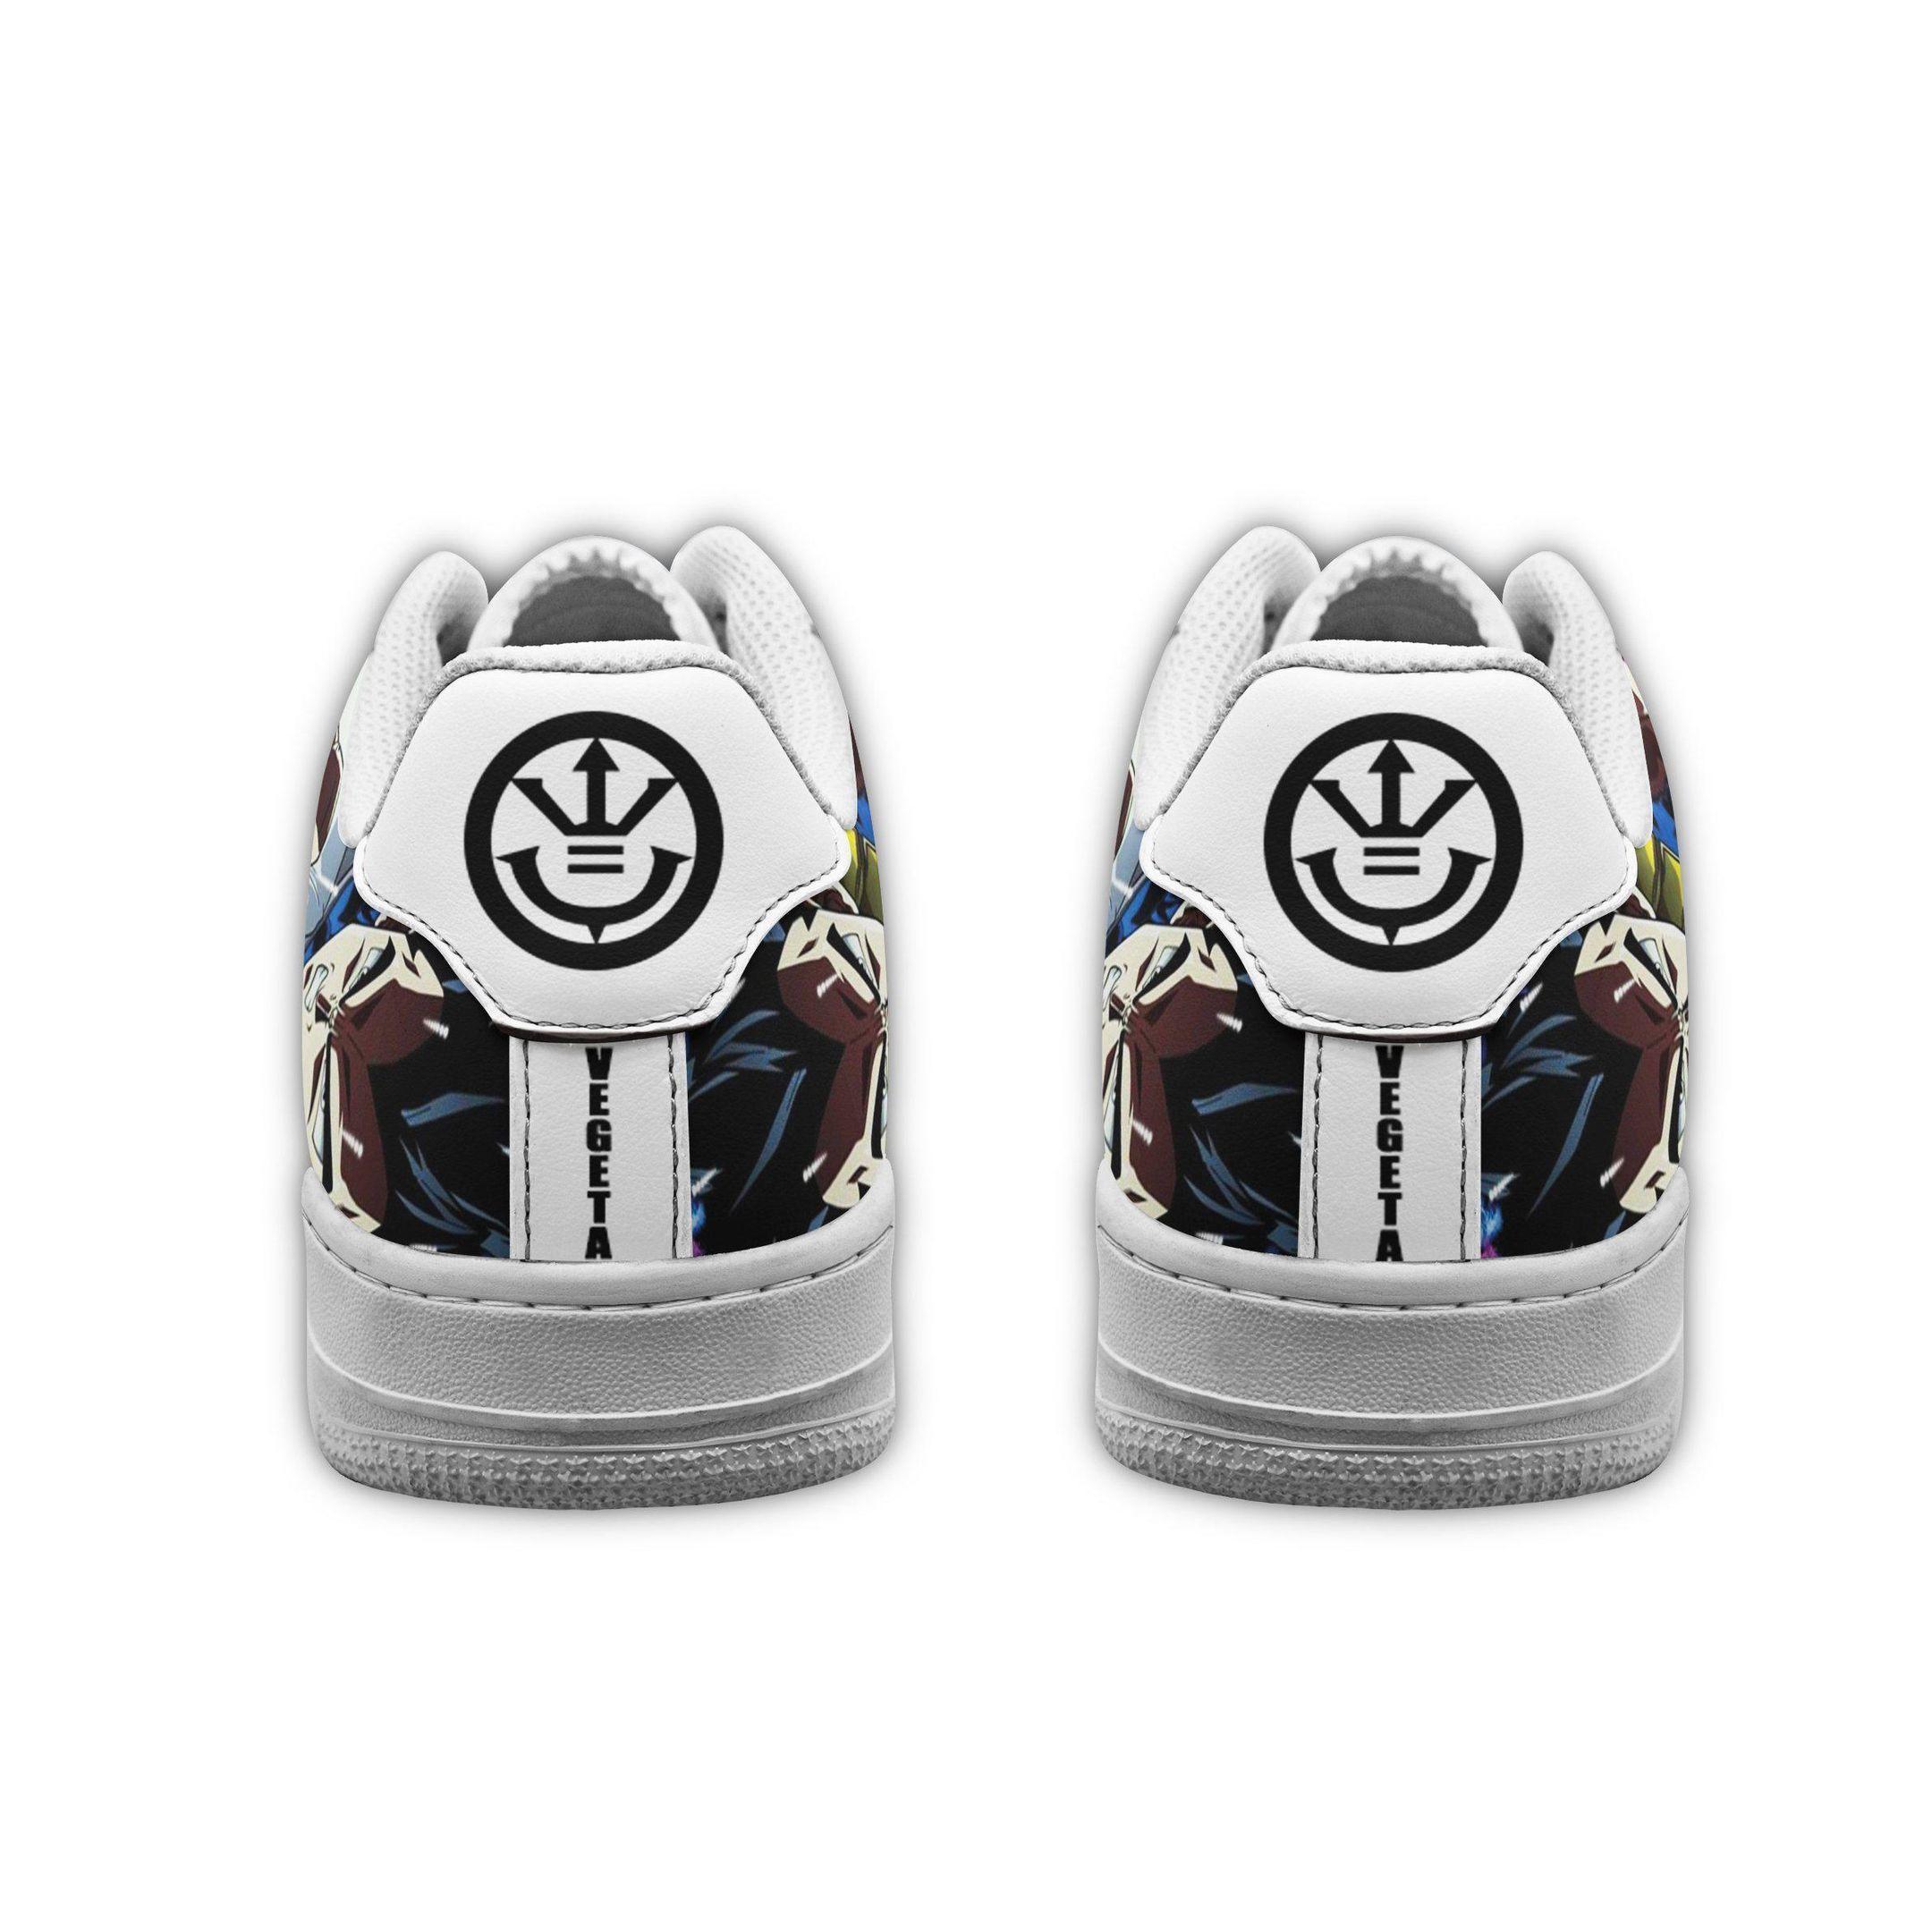 Vegeta Air Shoes Dragon Ball Z Anime Shoes Fan Gift GO1012